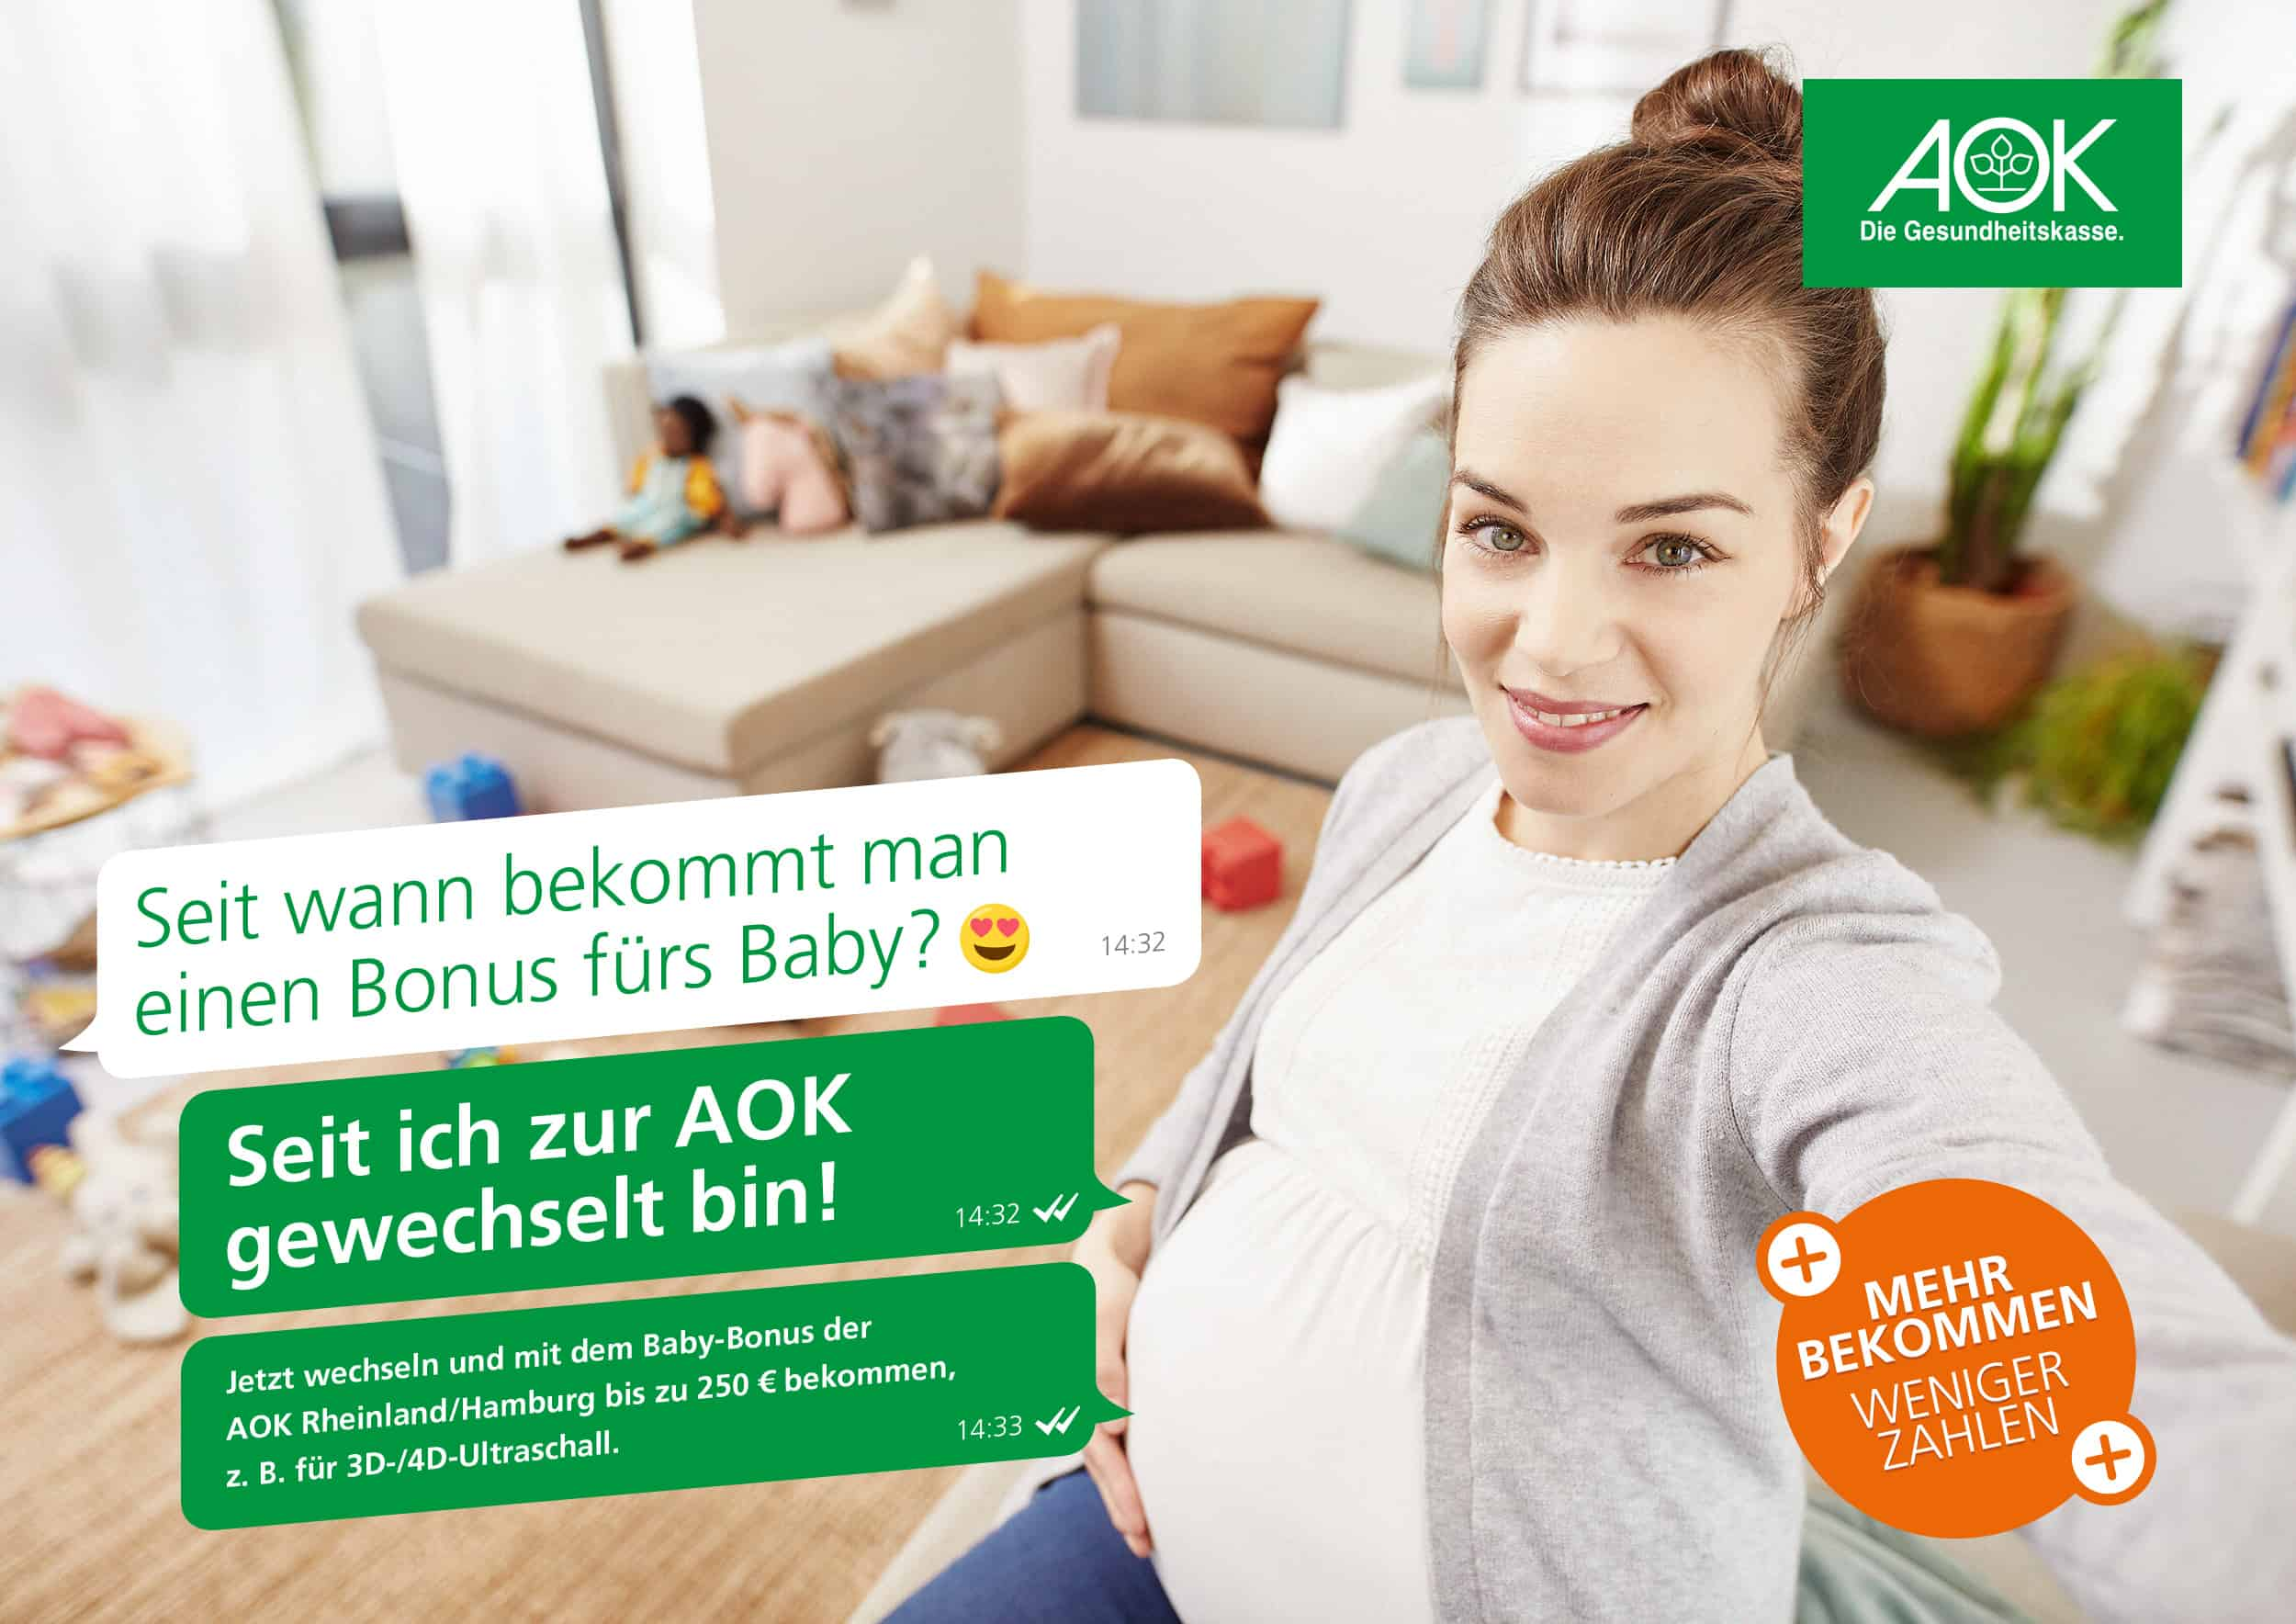 studio-ignatov-aok-jahreswechsel-babybonus-quer